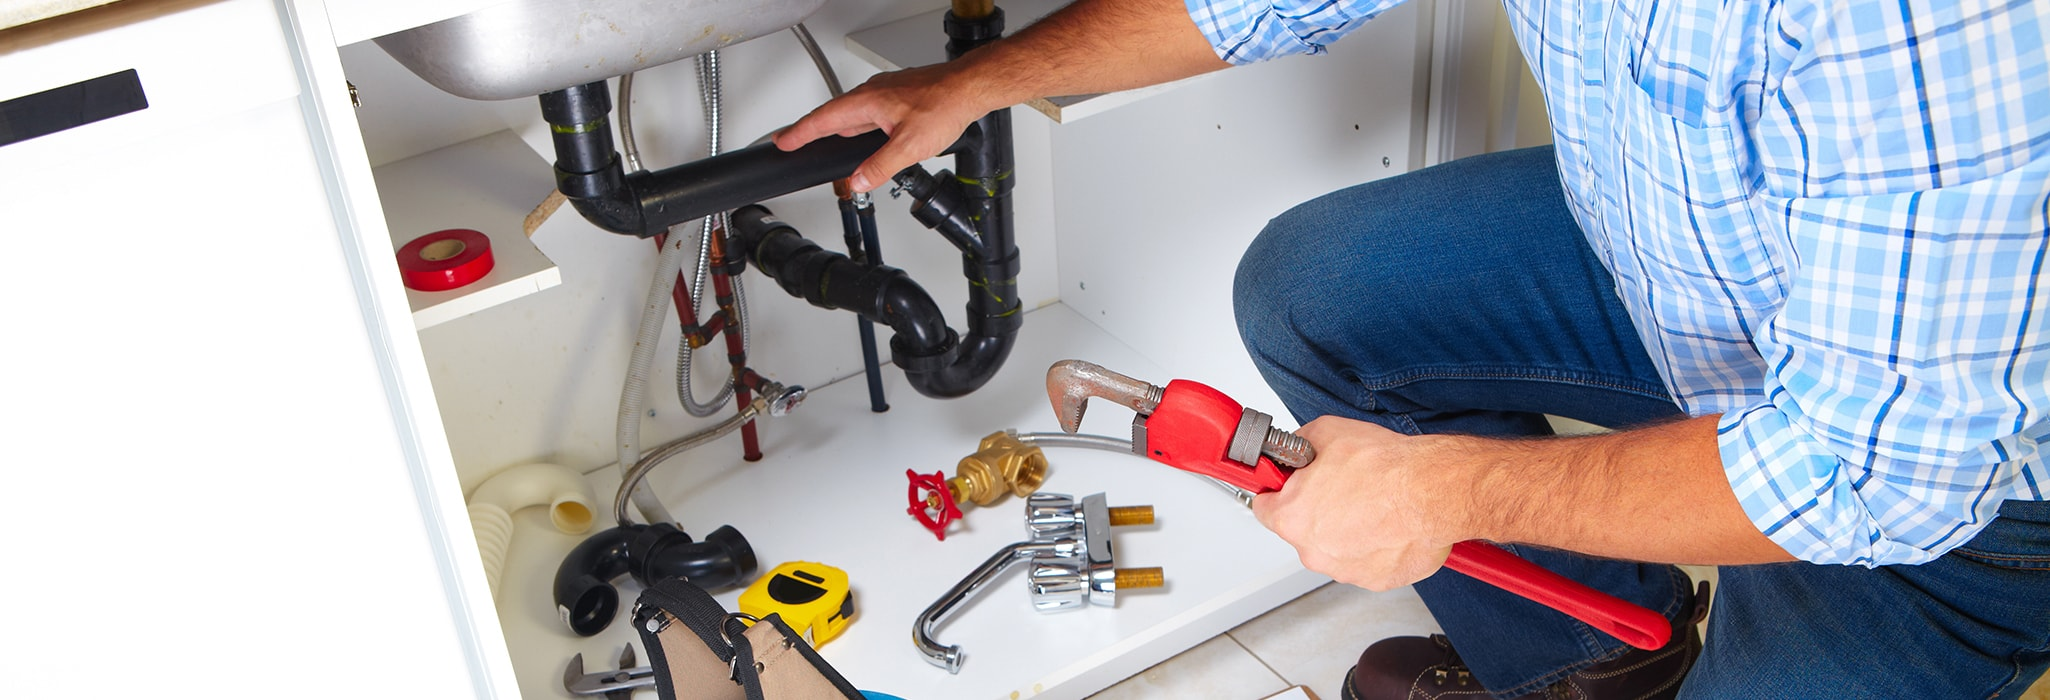 Plumbing Maintenance.